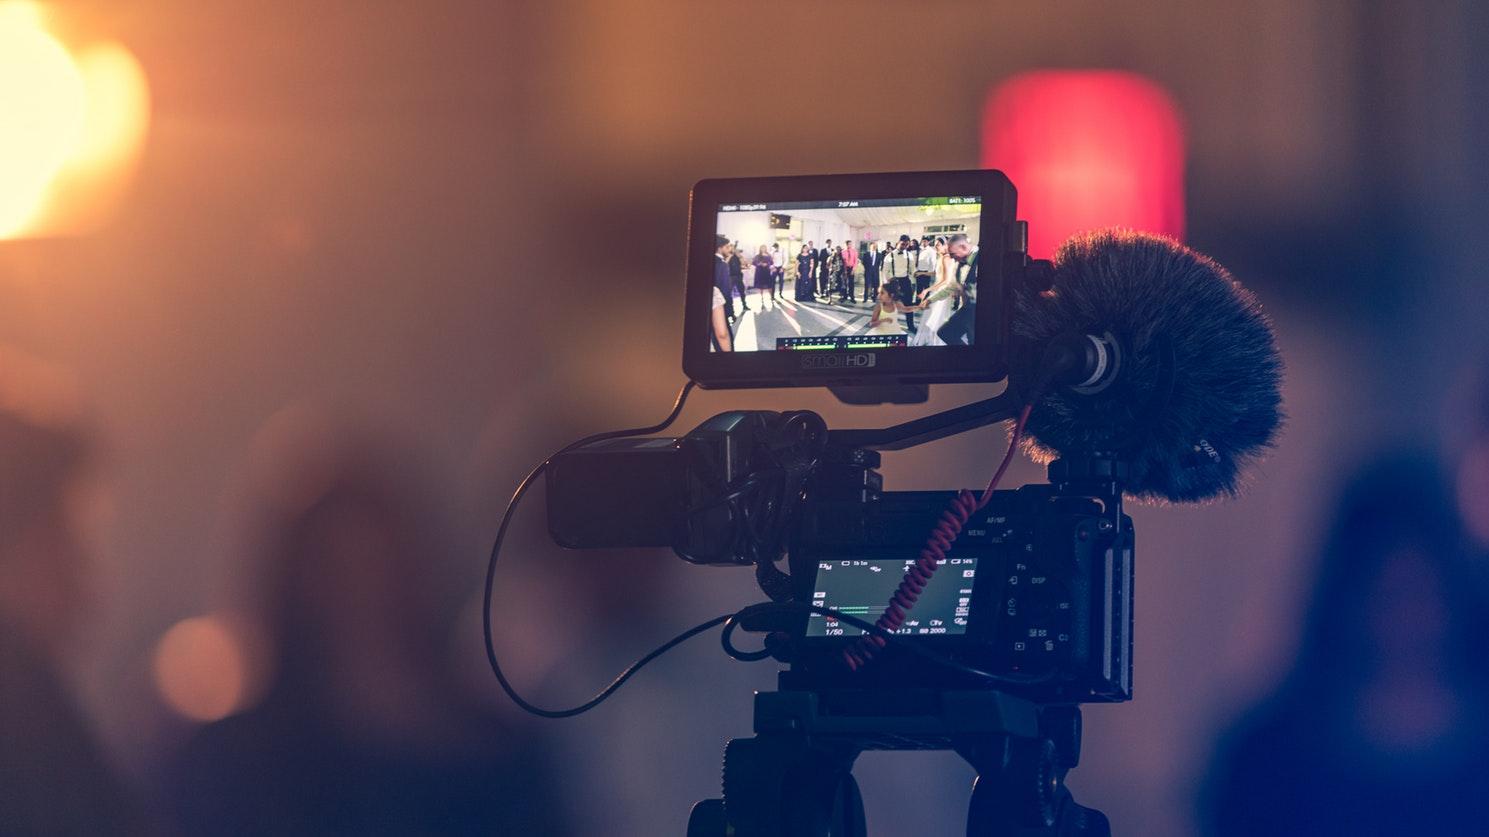 2 – Methuen drama video camera